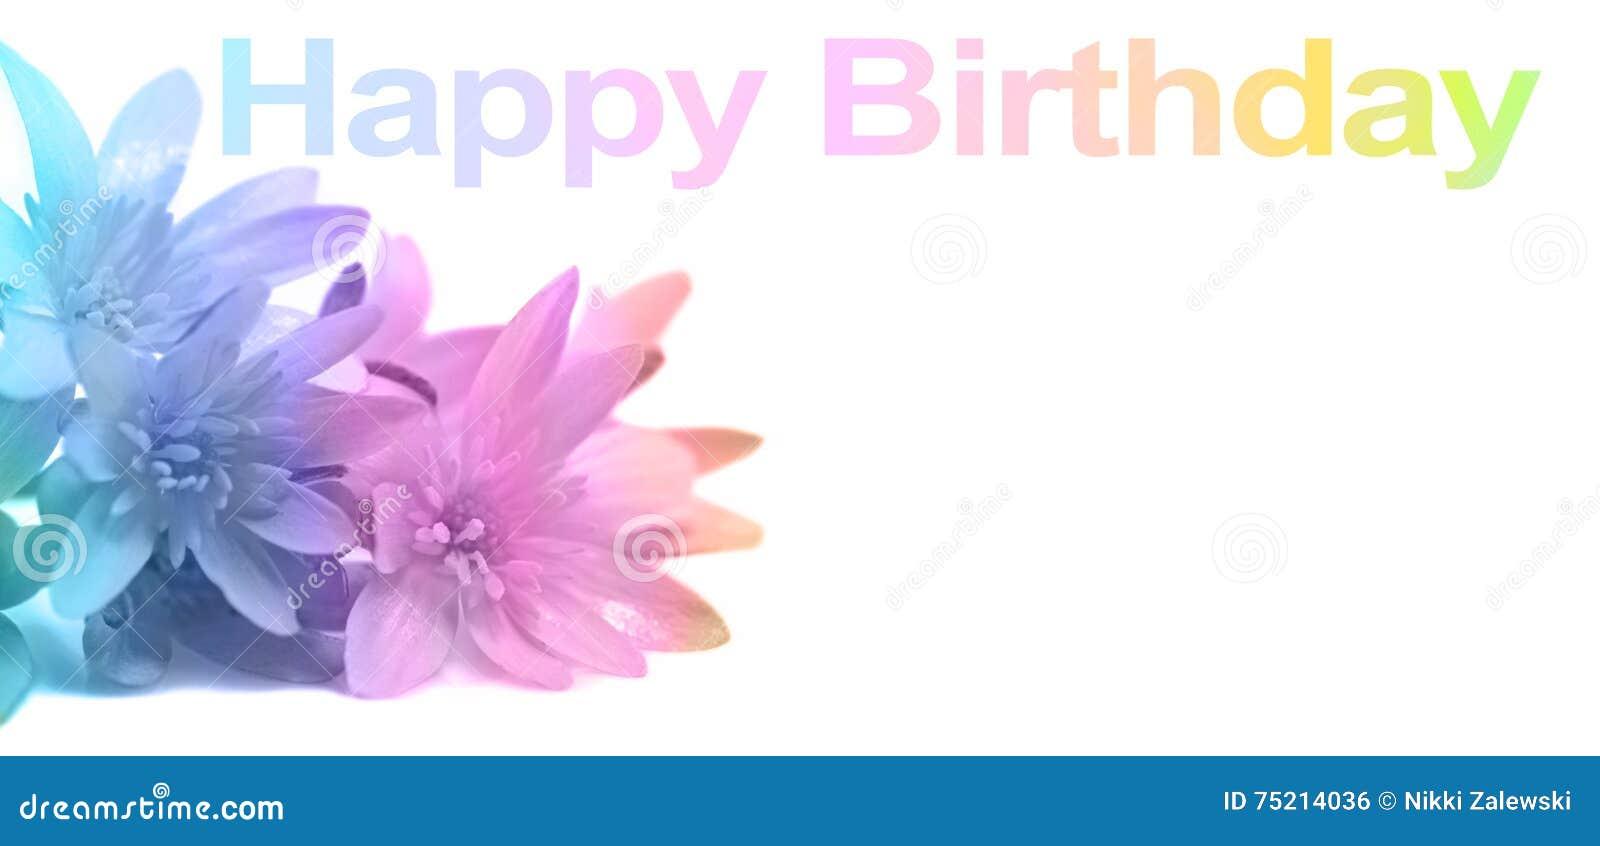 Say happy birthday with flowers stock illustration illustration of say happy birthday with flowers izmirmasajfo Choice Image